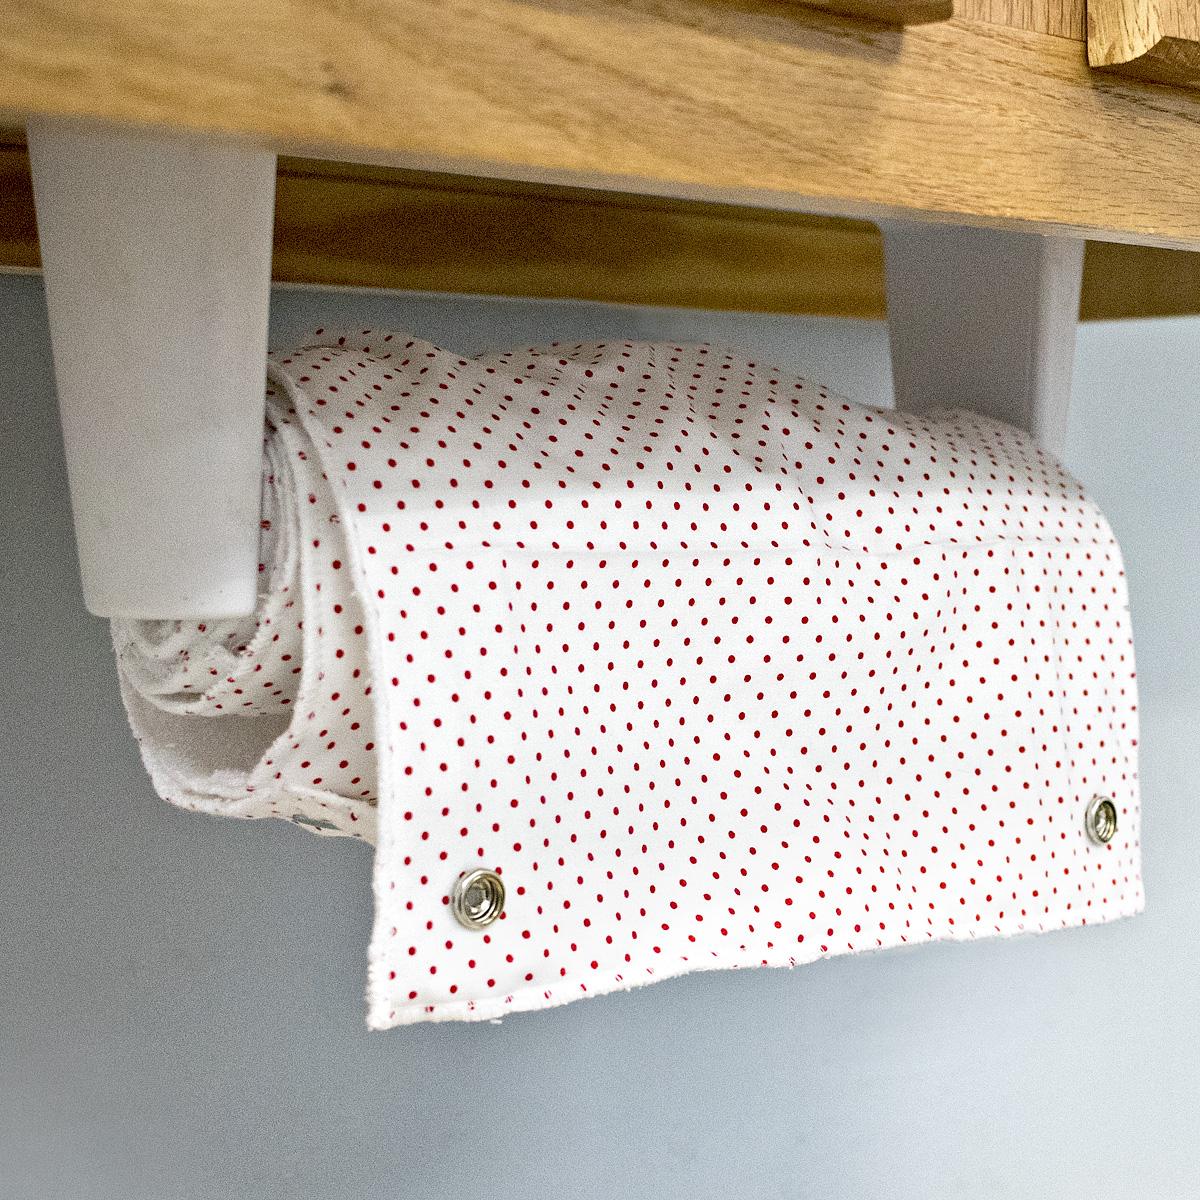 Finished Un-Paper Towels